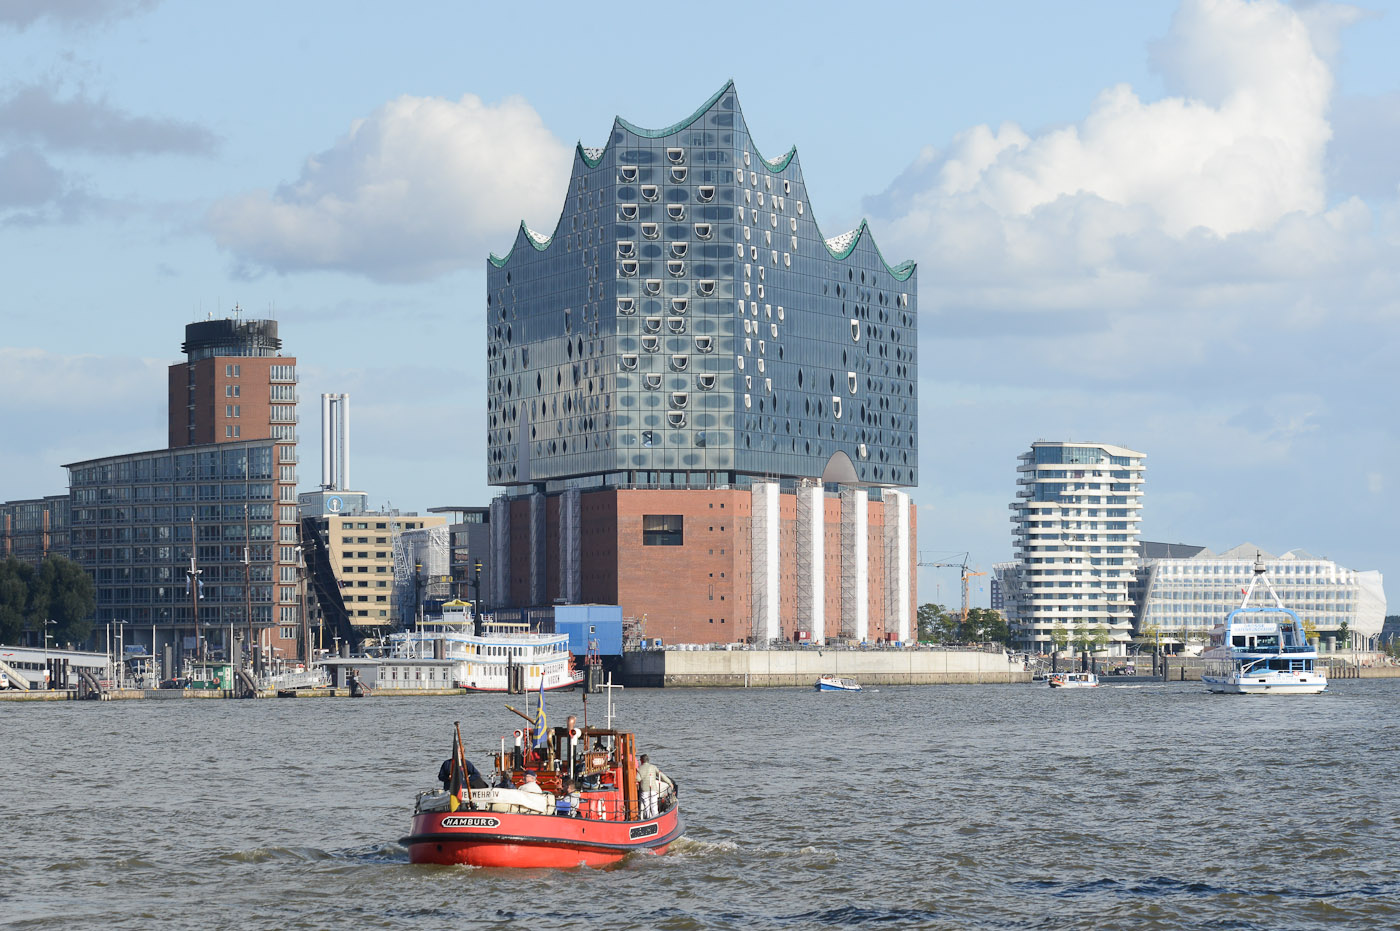 Der Küchengott Hamburg ~ foto id 15100603 elbphilharmonie hamburg u203a fotograf